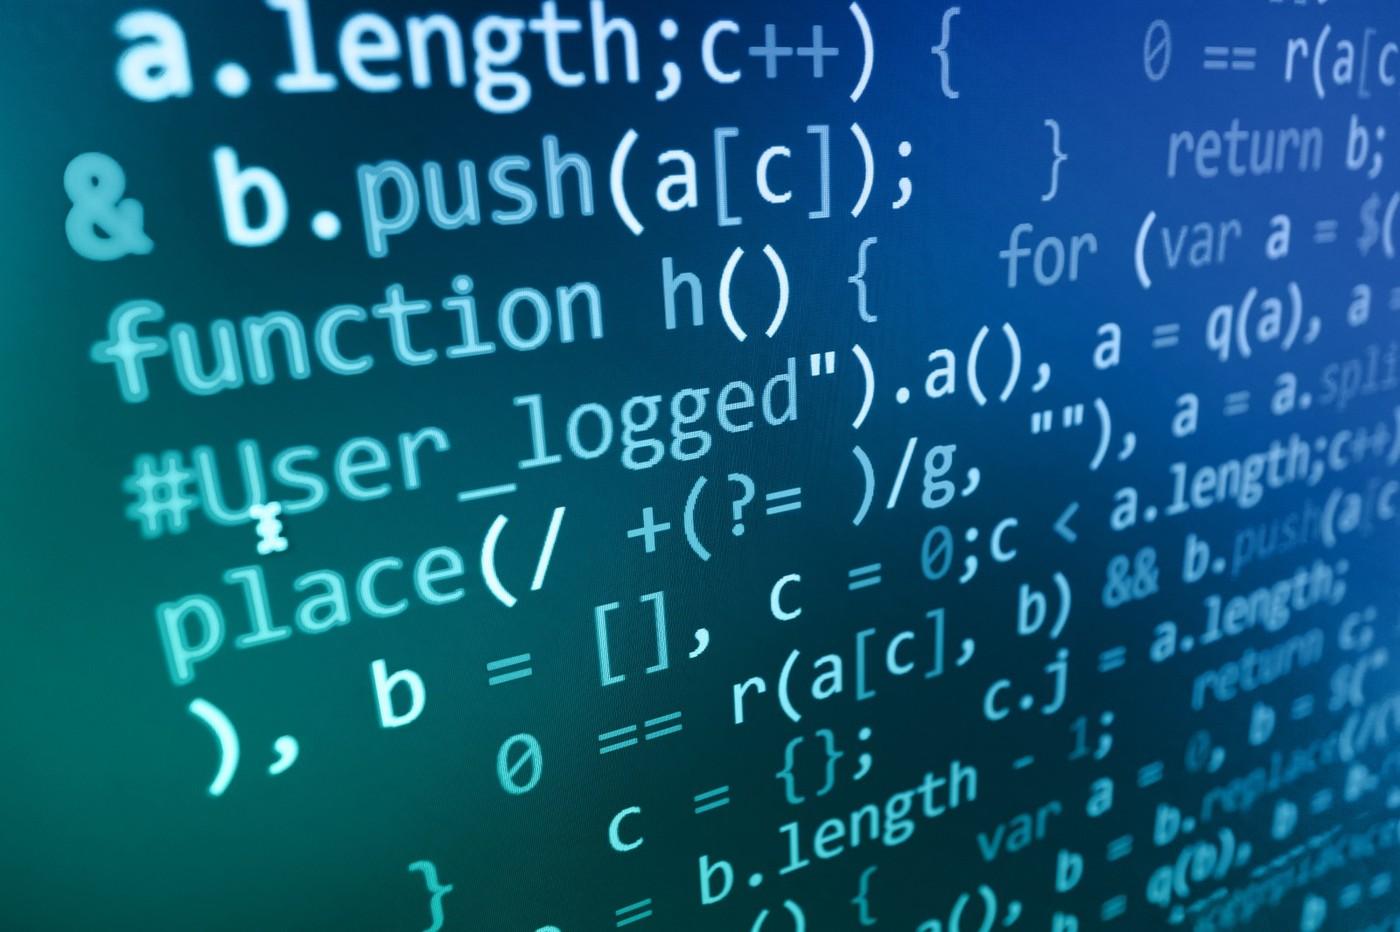 GitHub揭3大開源趨勢:Python首度超越Java躍升社群第二大程式語言